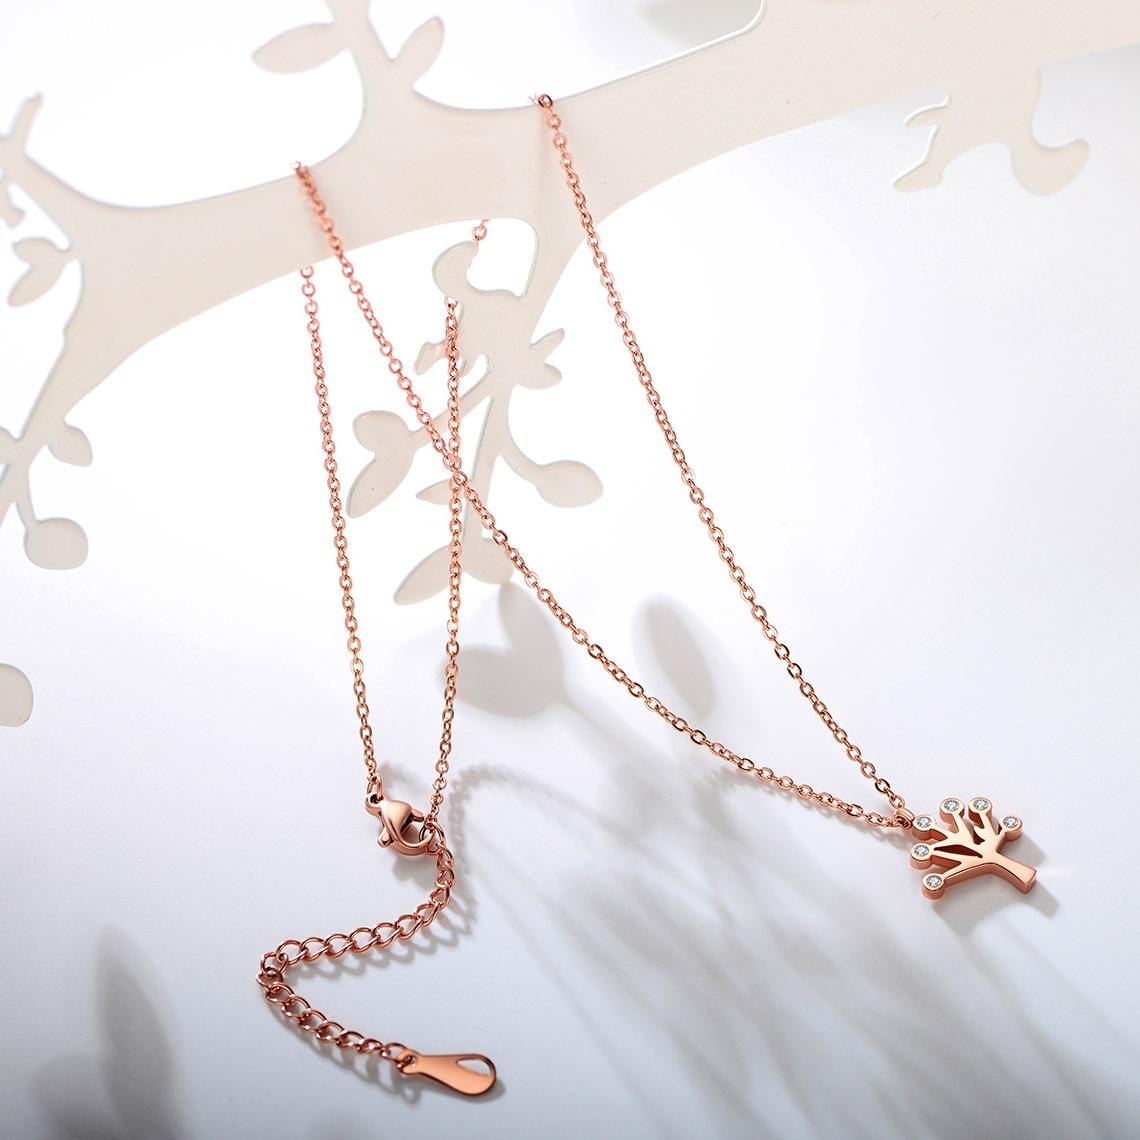 Simple Titanium steel plating necklace (Rose gold)NHIM0636-Rose gold